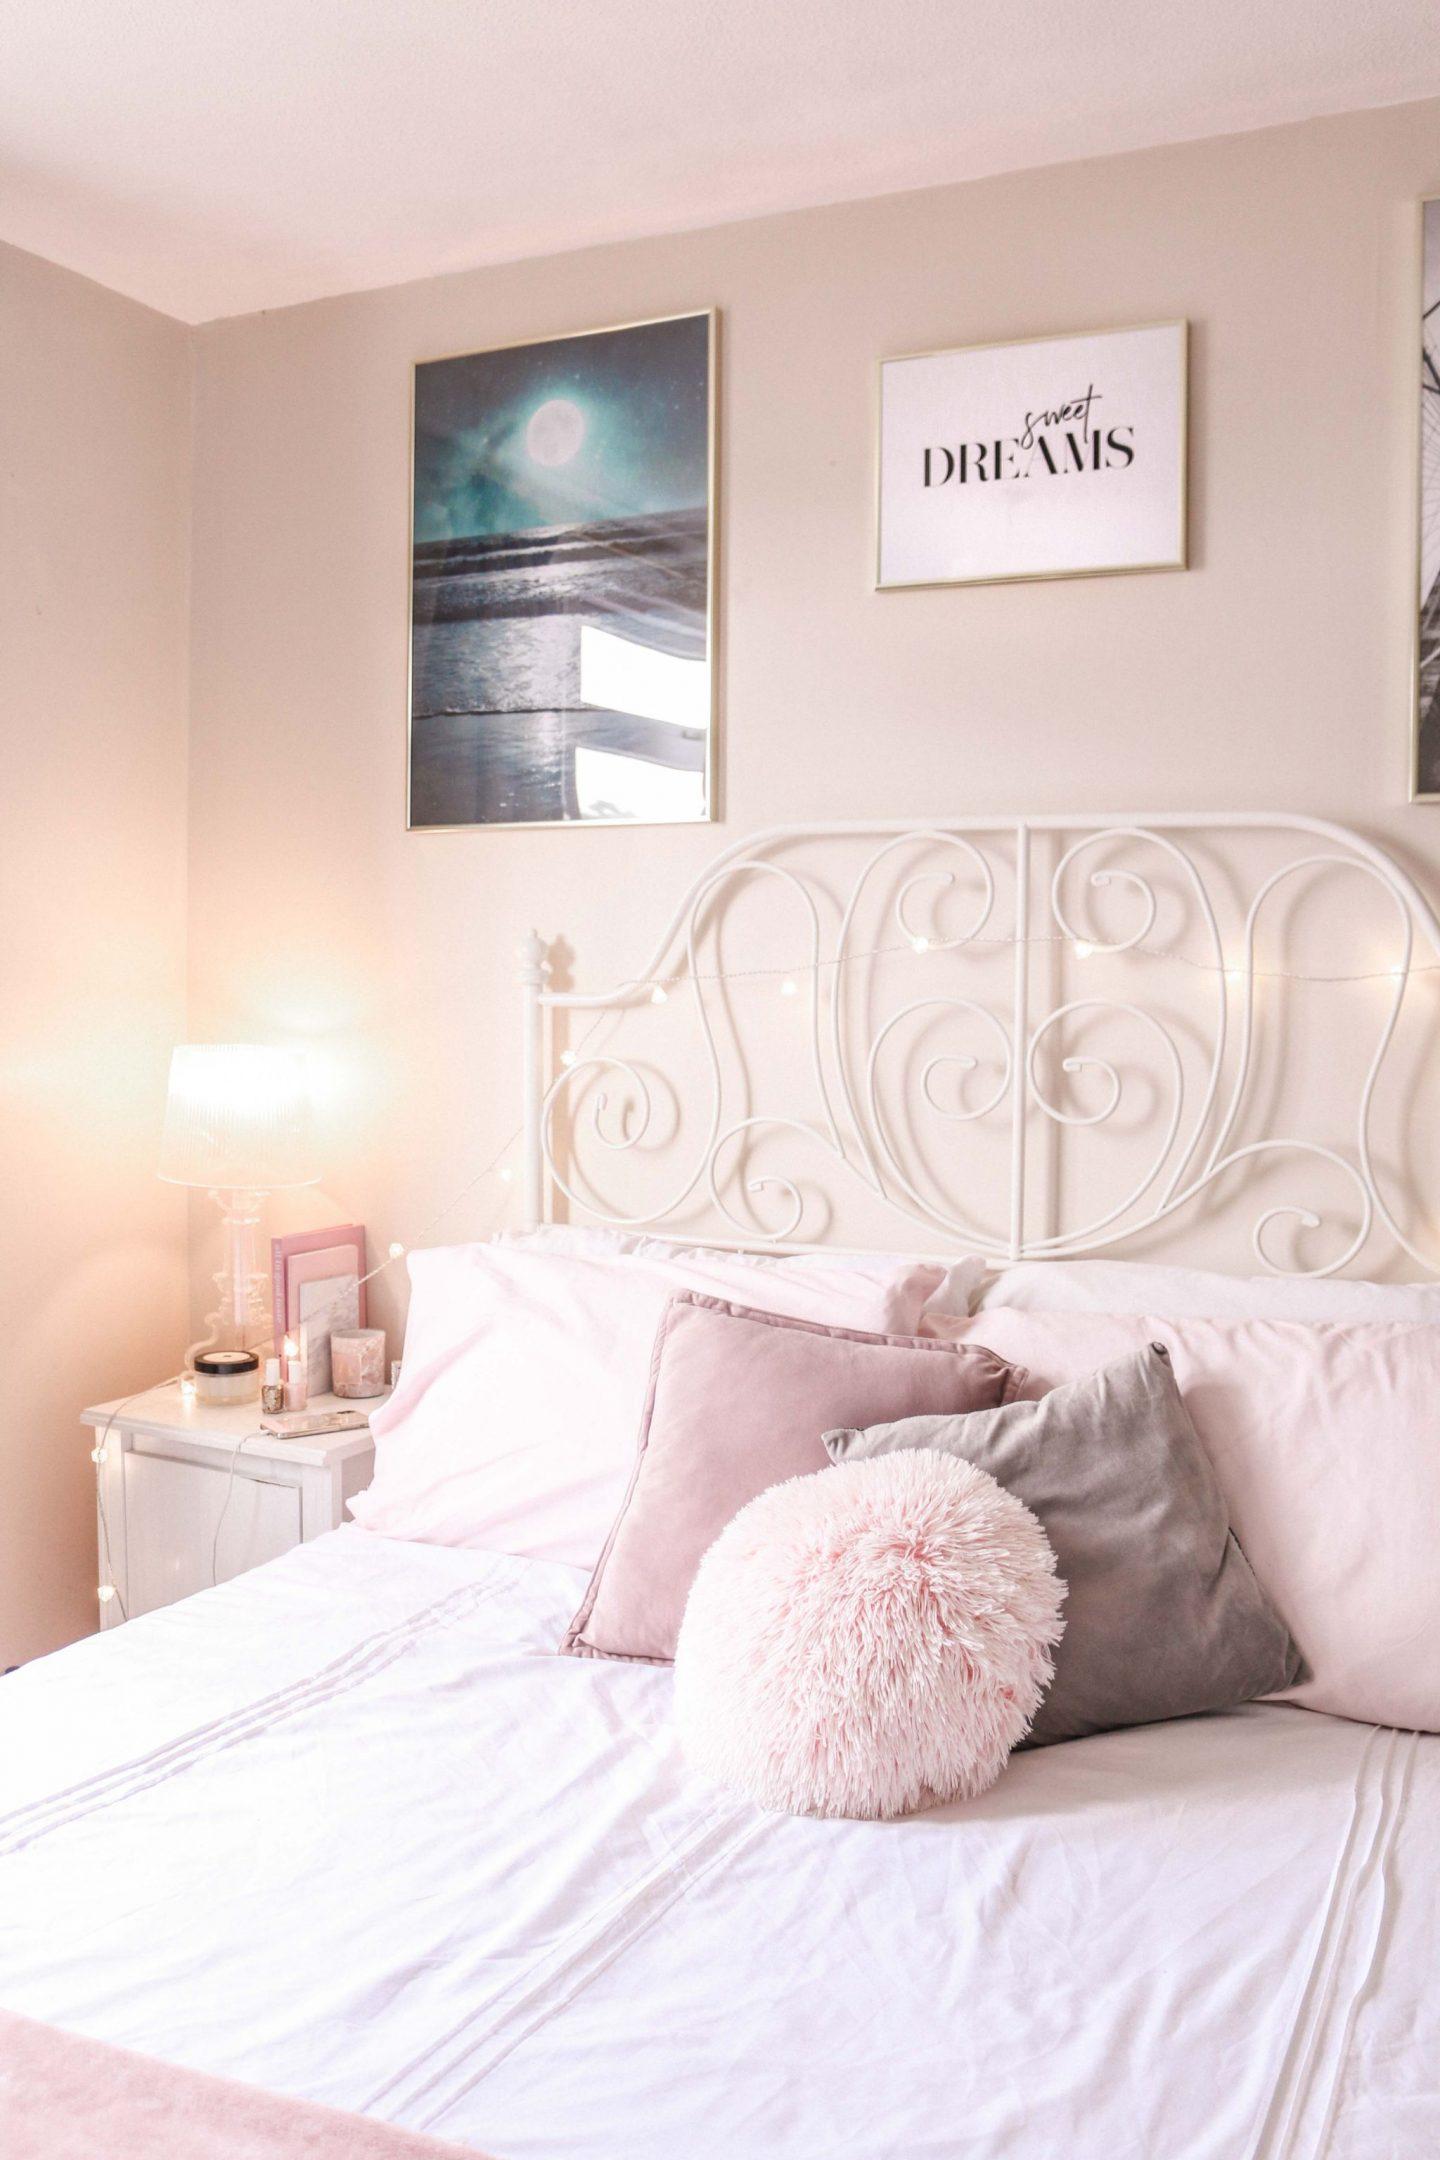 5 ways to make your bedroom more relaxing, how to sleep, how to get to sleep easier, how to relax, ways to unwind, bedroom decor, desenio prints, desenio posters, pastel bedroom, relax, sleep,